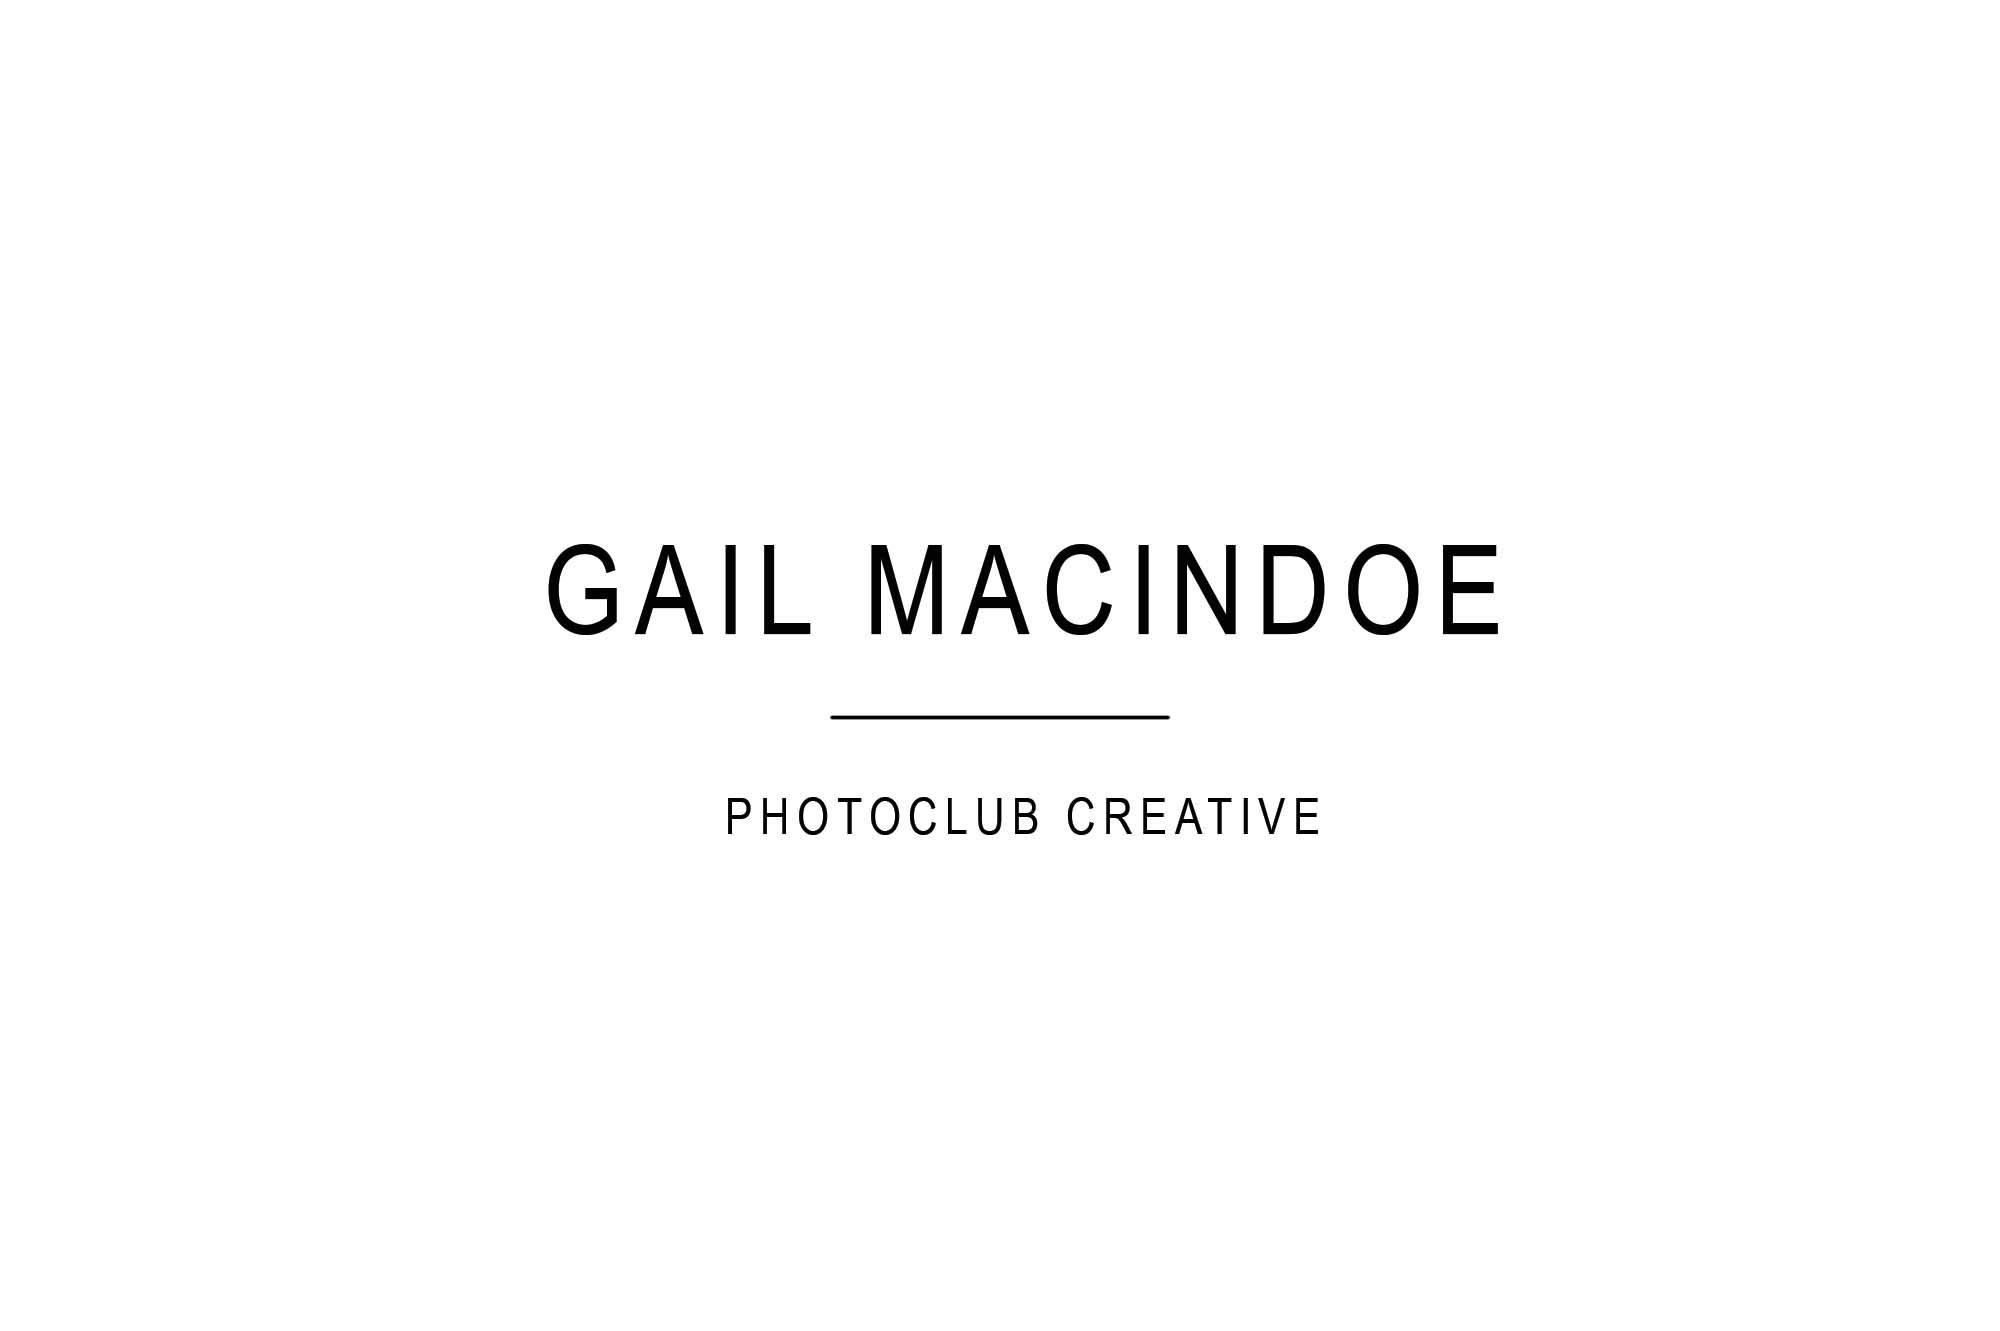 GailMacindoe_00_Title_WhtBg.jpg